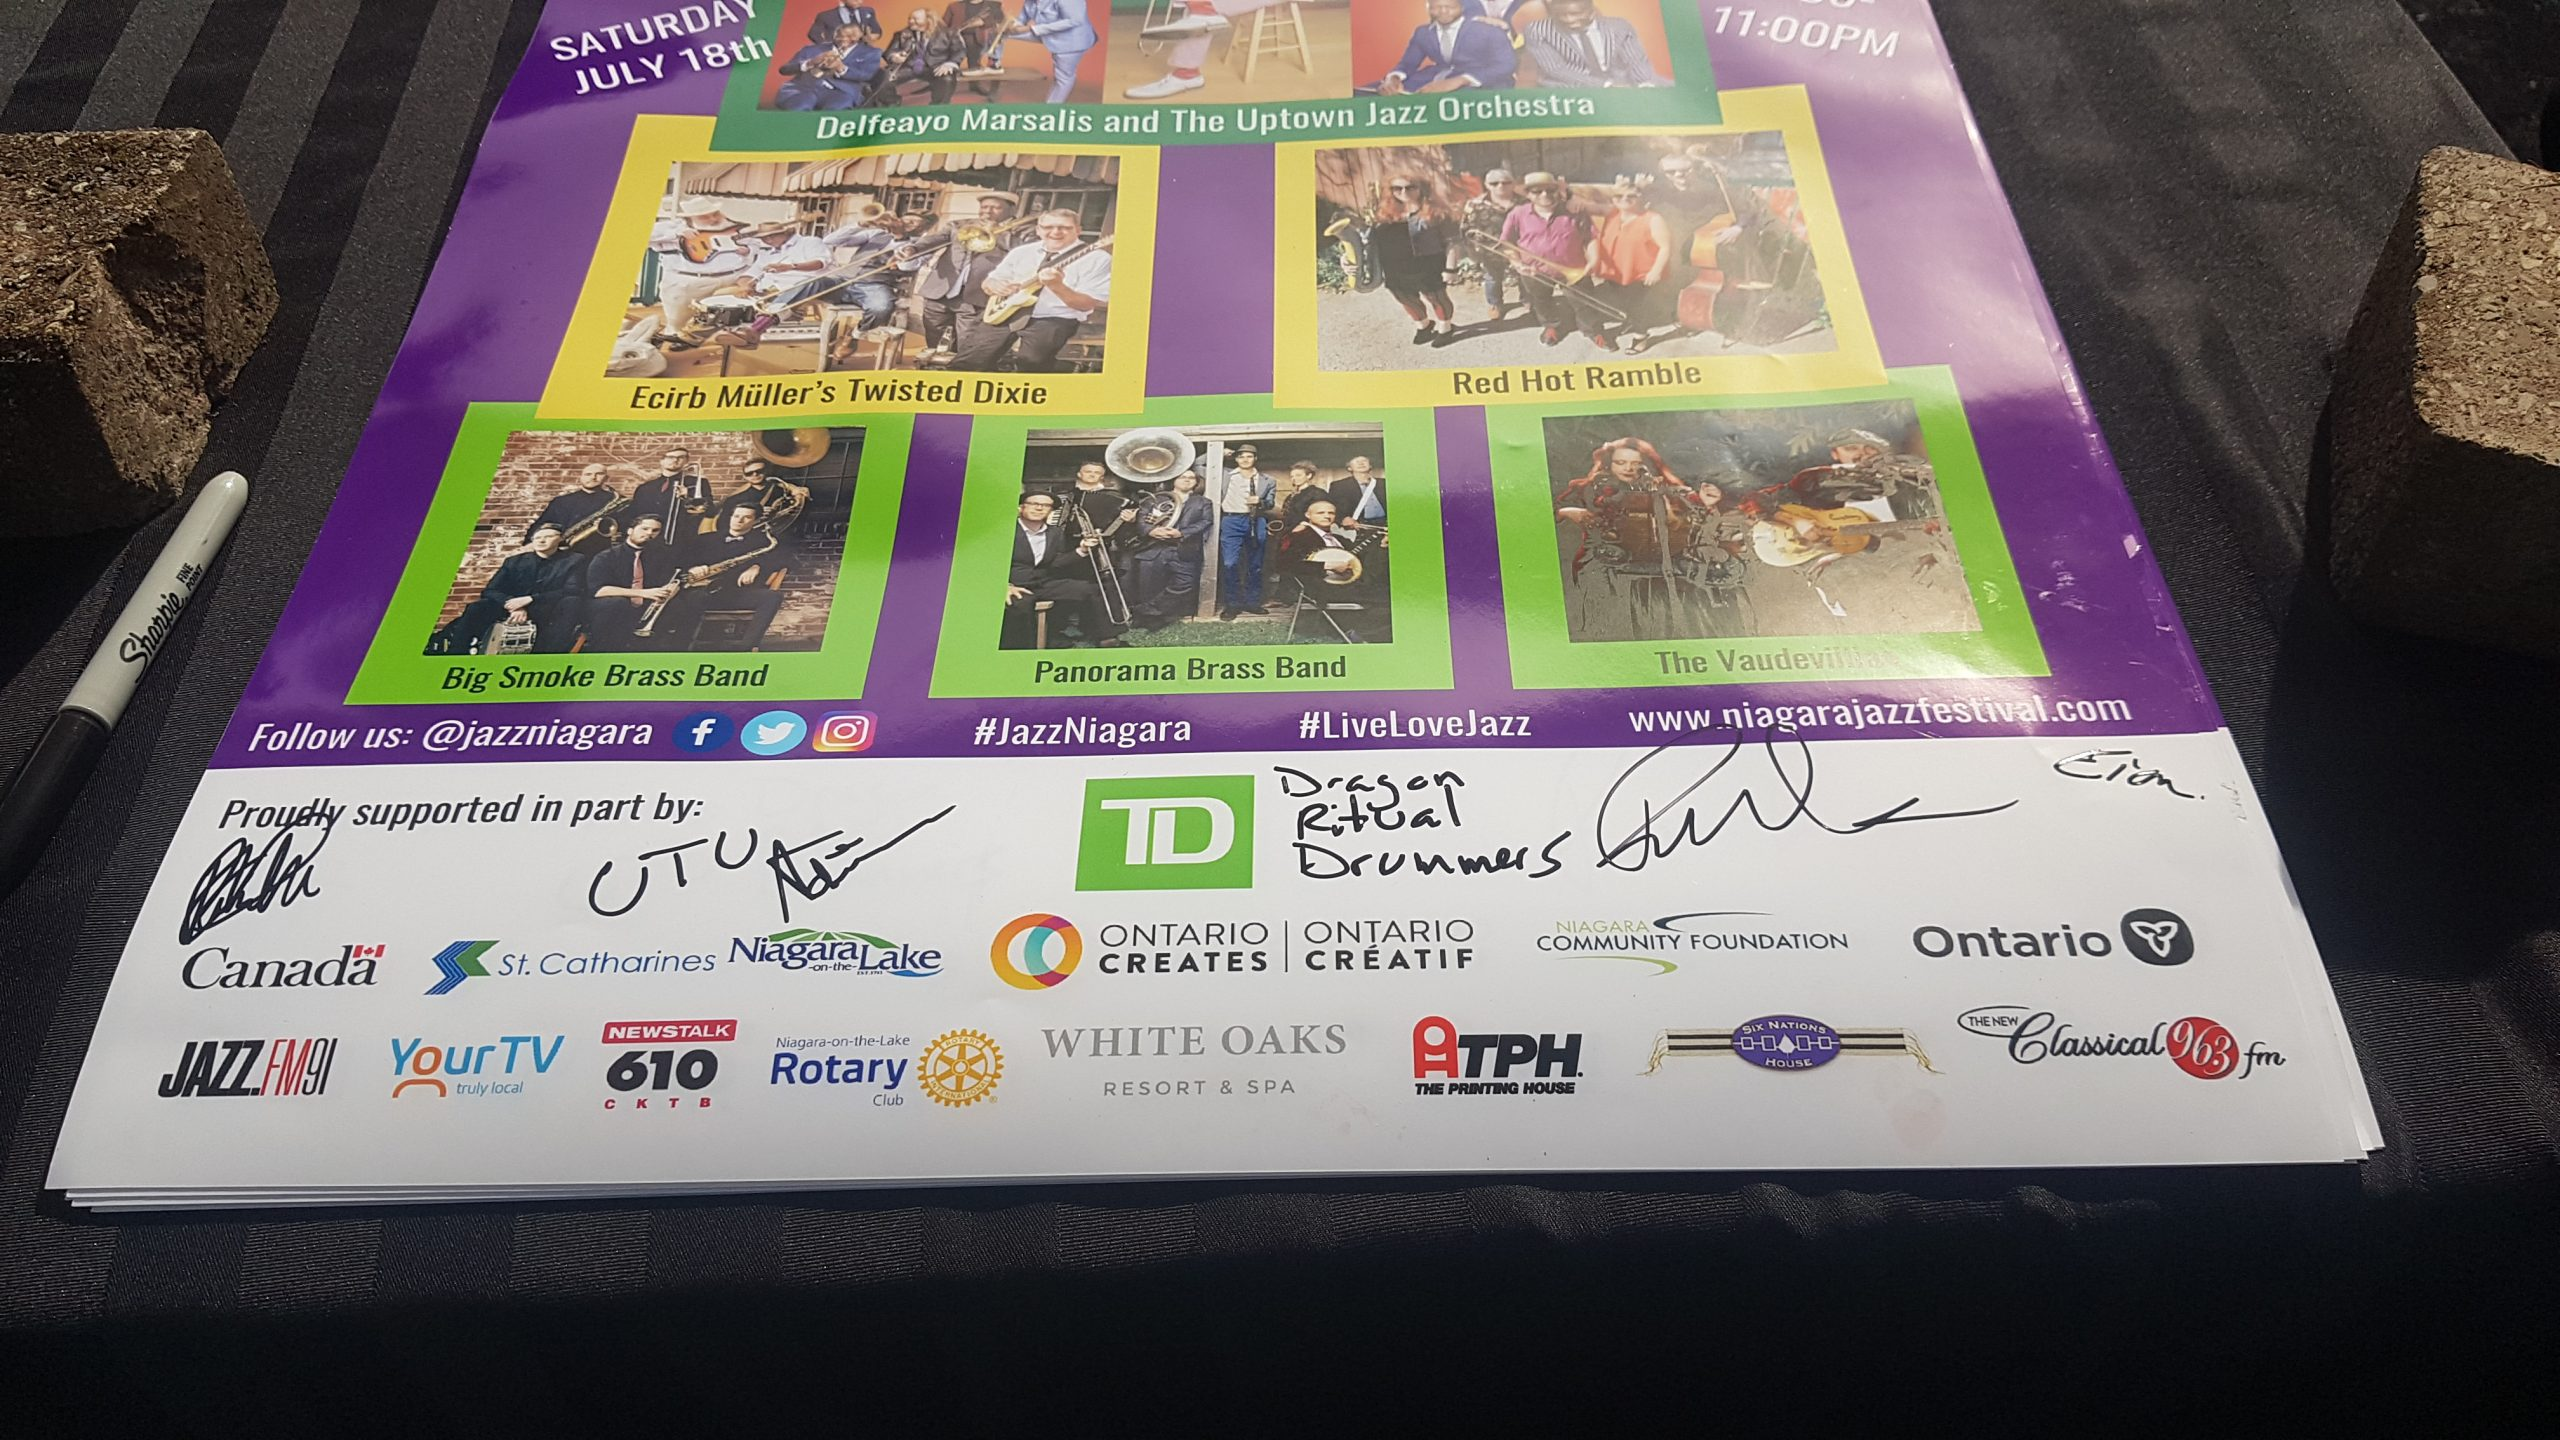 Poster - Niagara's ONLINE Summer Mardi Gras - Saturday, July 18, 2020. Photo: Nicholas Paolone